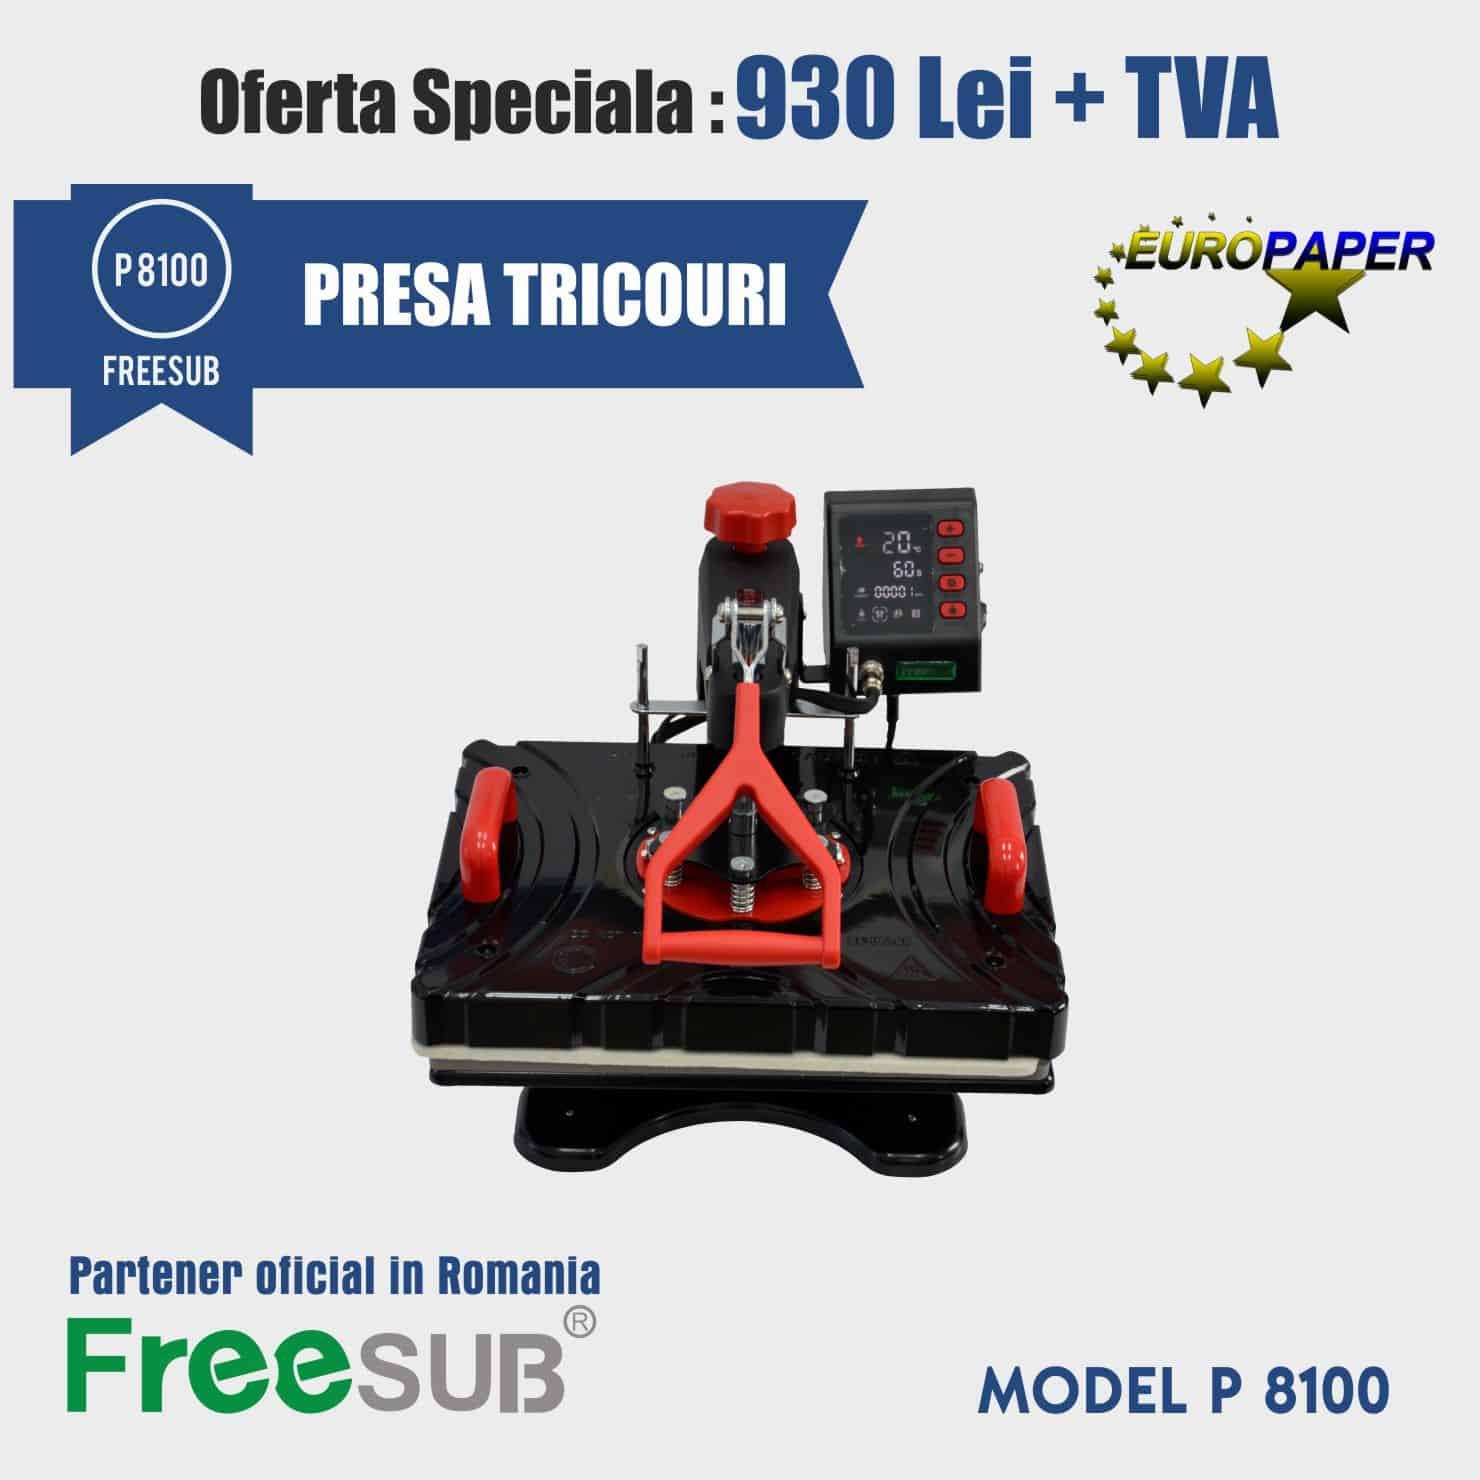 FREESUB P8100